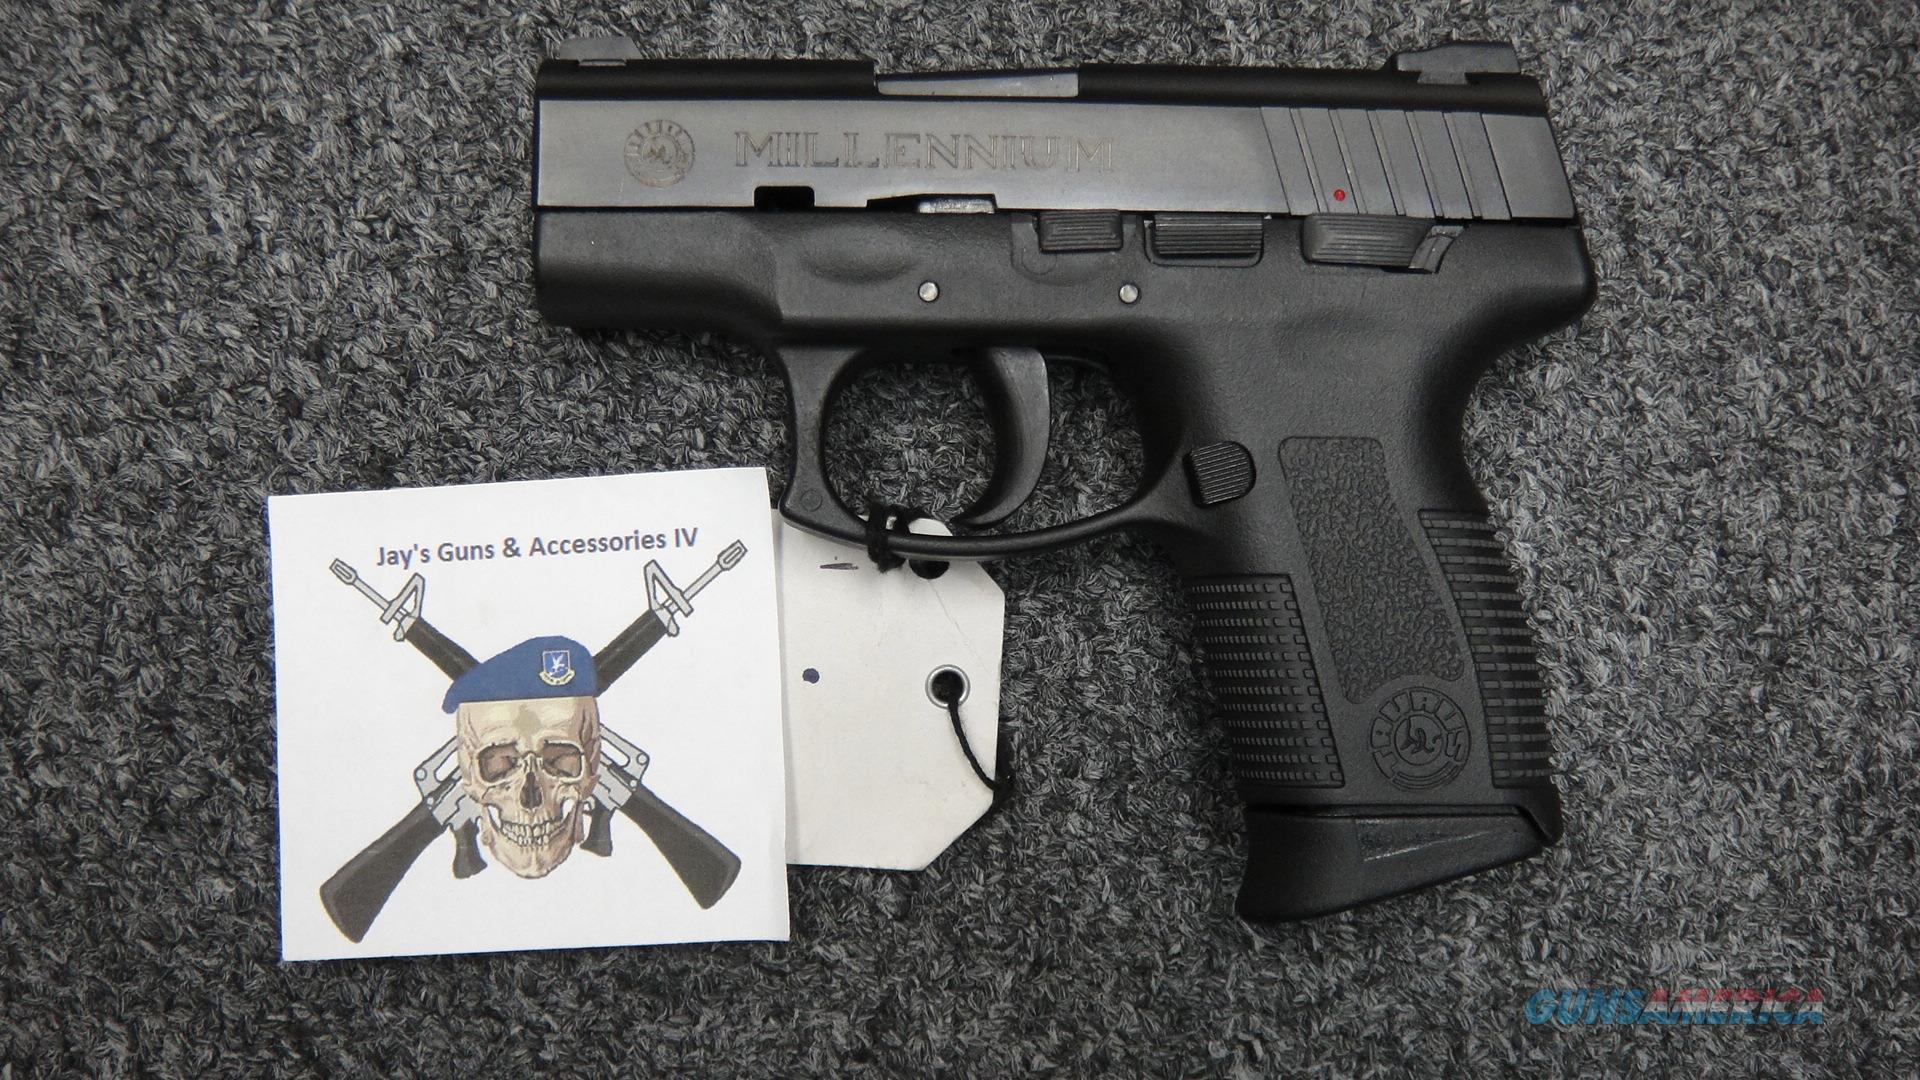 Taurus PT140 PRO .40S&W 10+1  Guns > Pistols > Taurus Pistols > Semi Auto Pistols > Polymer Frame